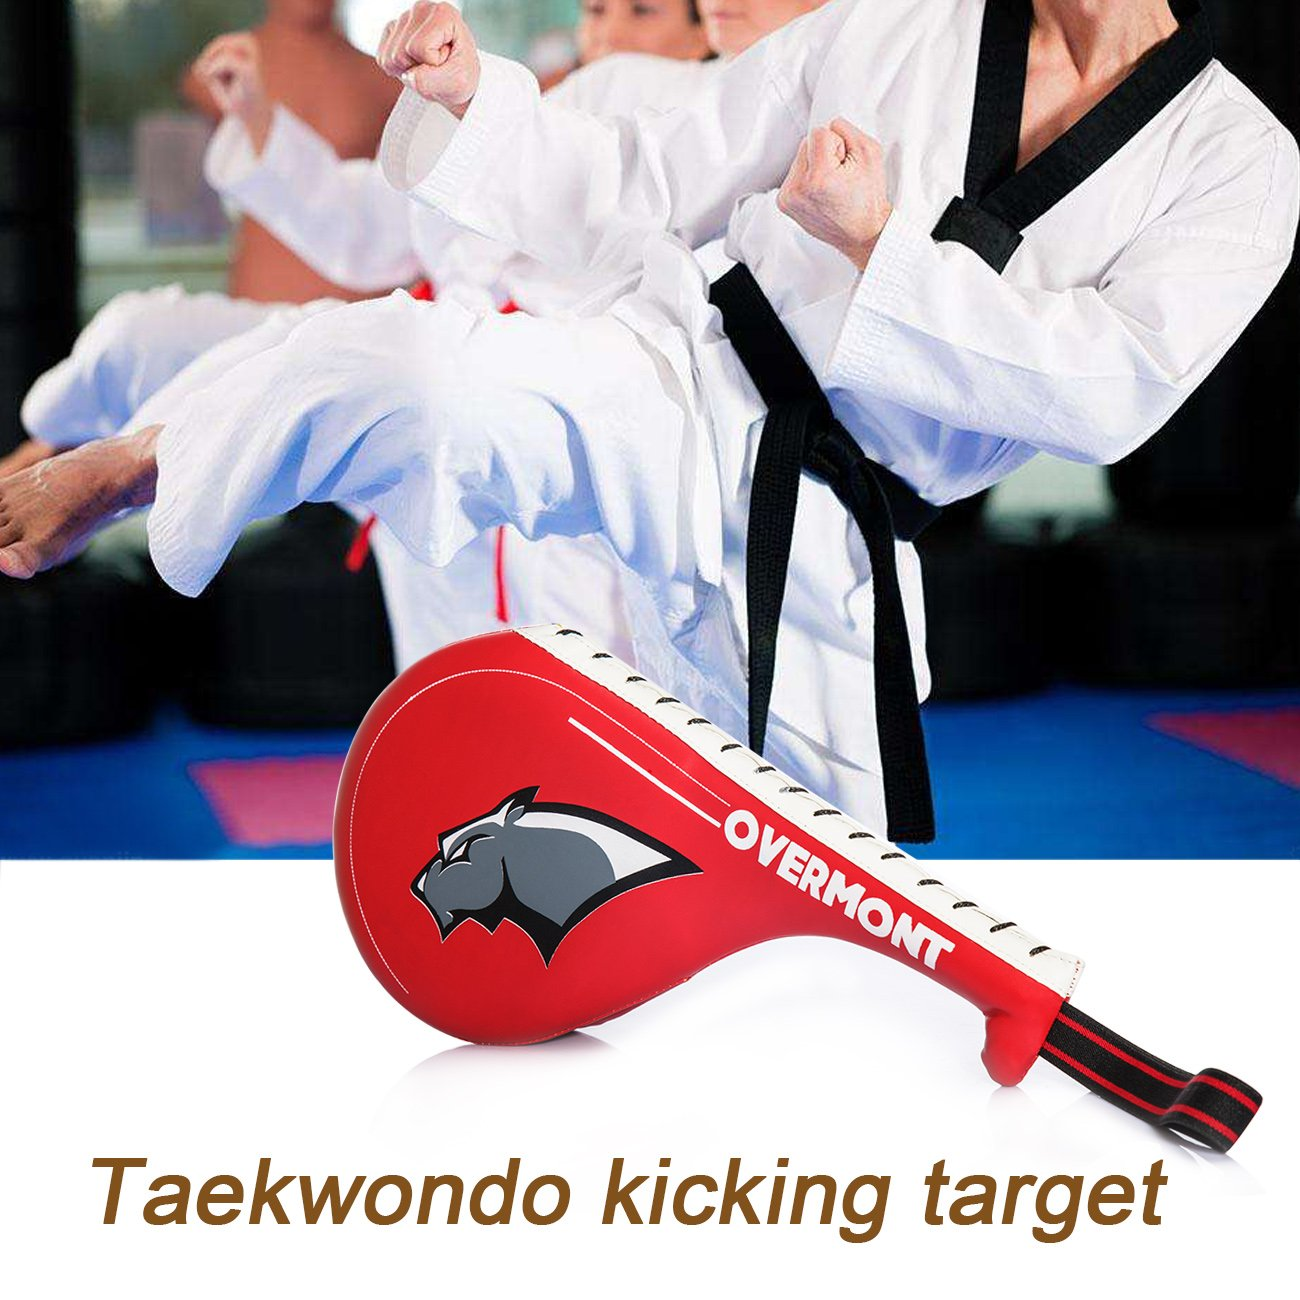 Overmont Double Kicking Target Taekwondo Kick Pads TKD Training Karate Kickboxing judo Practice MMA Muay Thai Martial Arts black//red